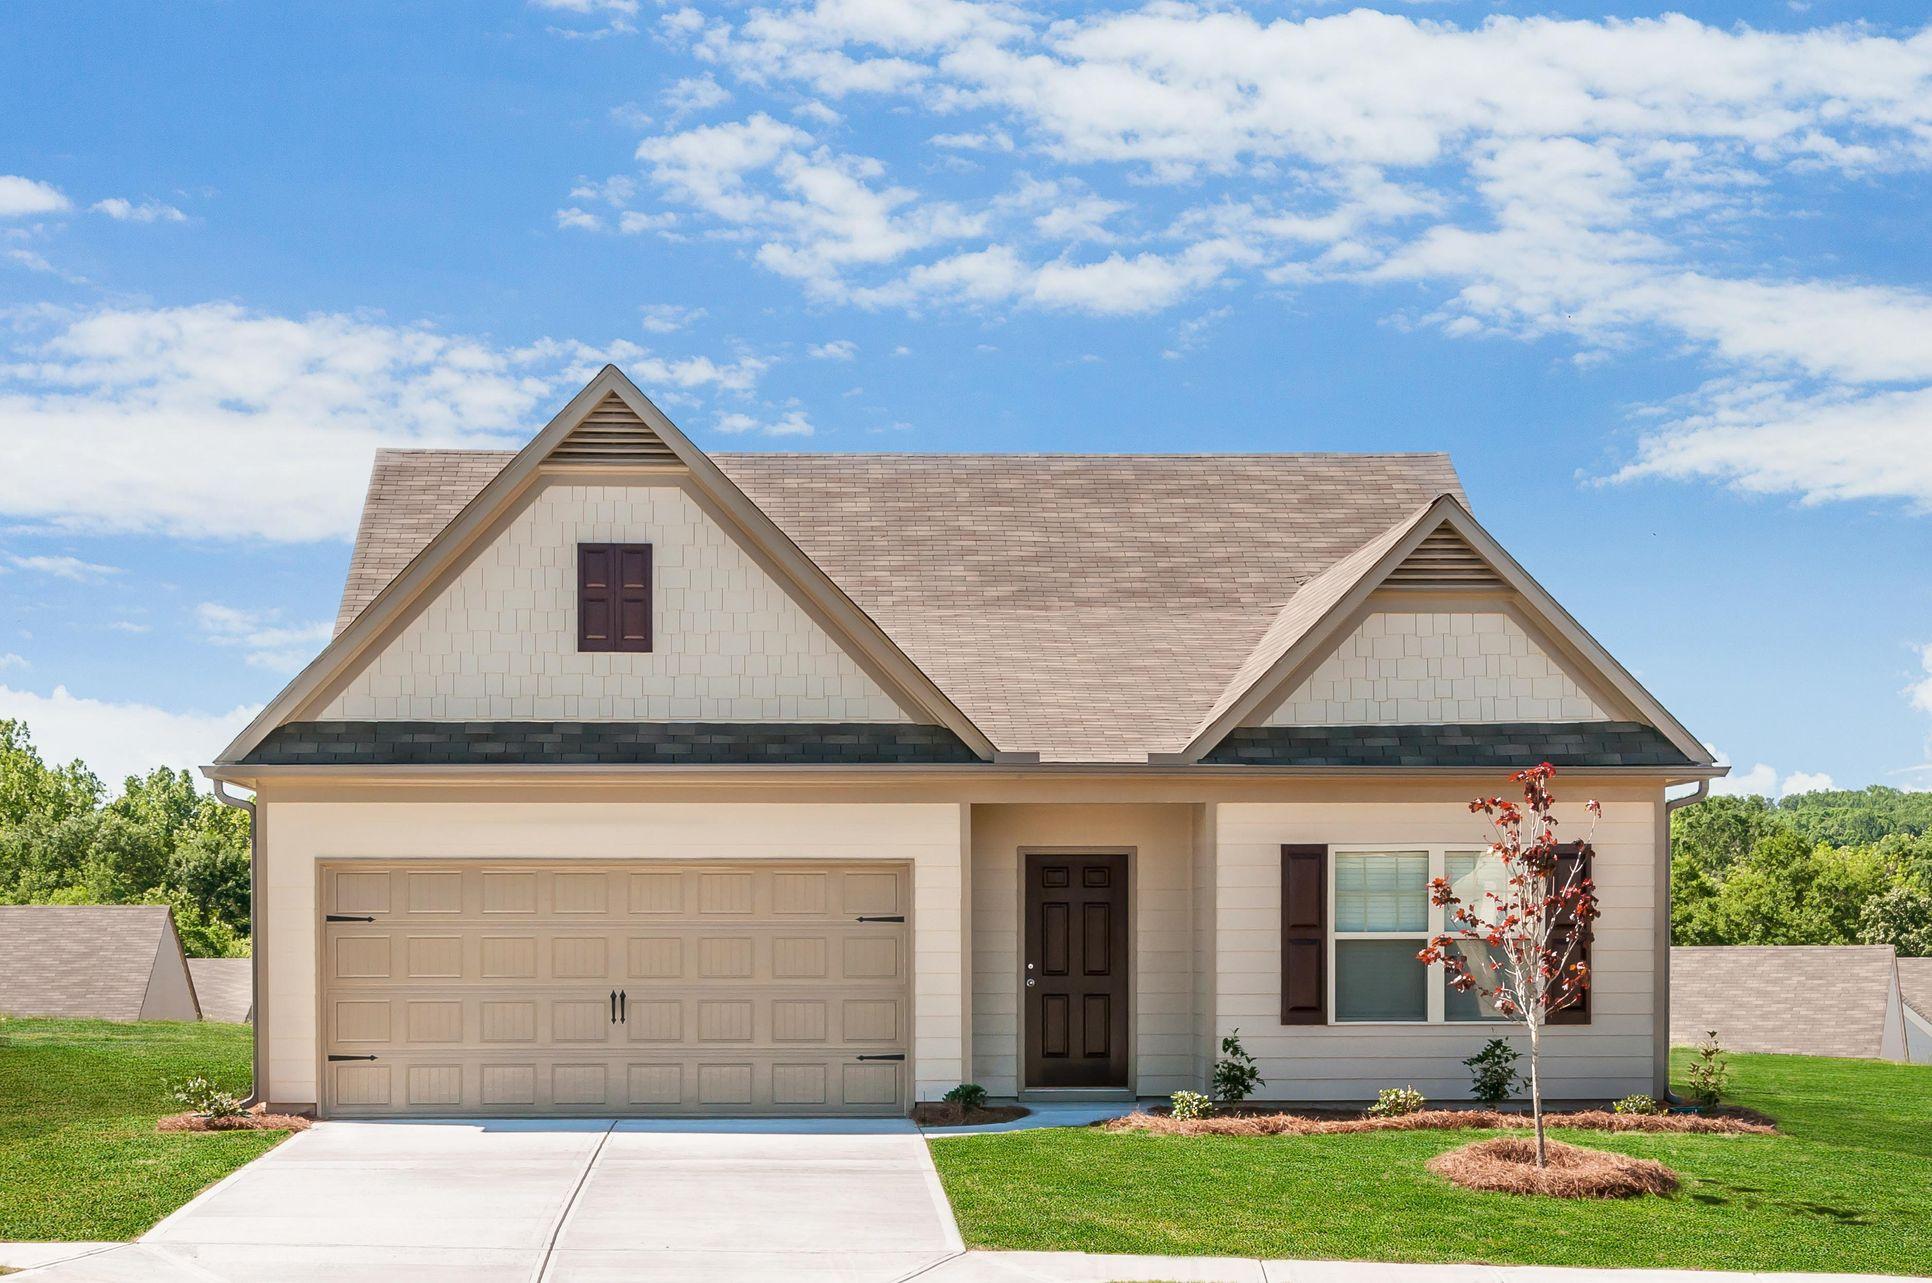 LGI Homes at Creekside Manor:The Allatoona